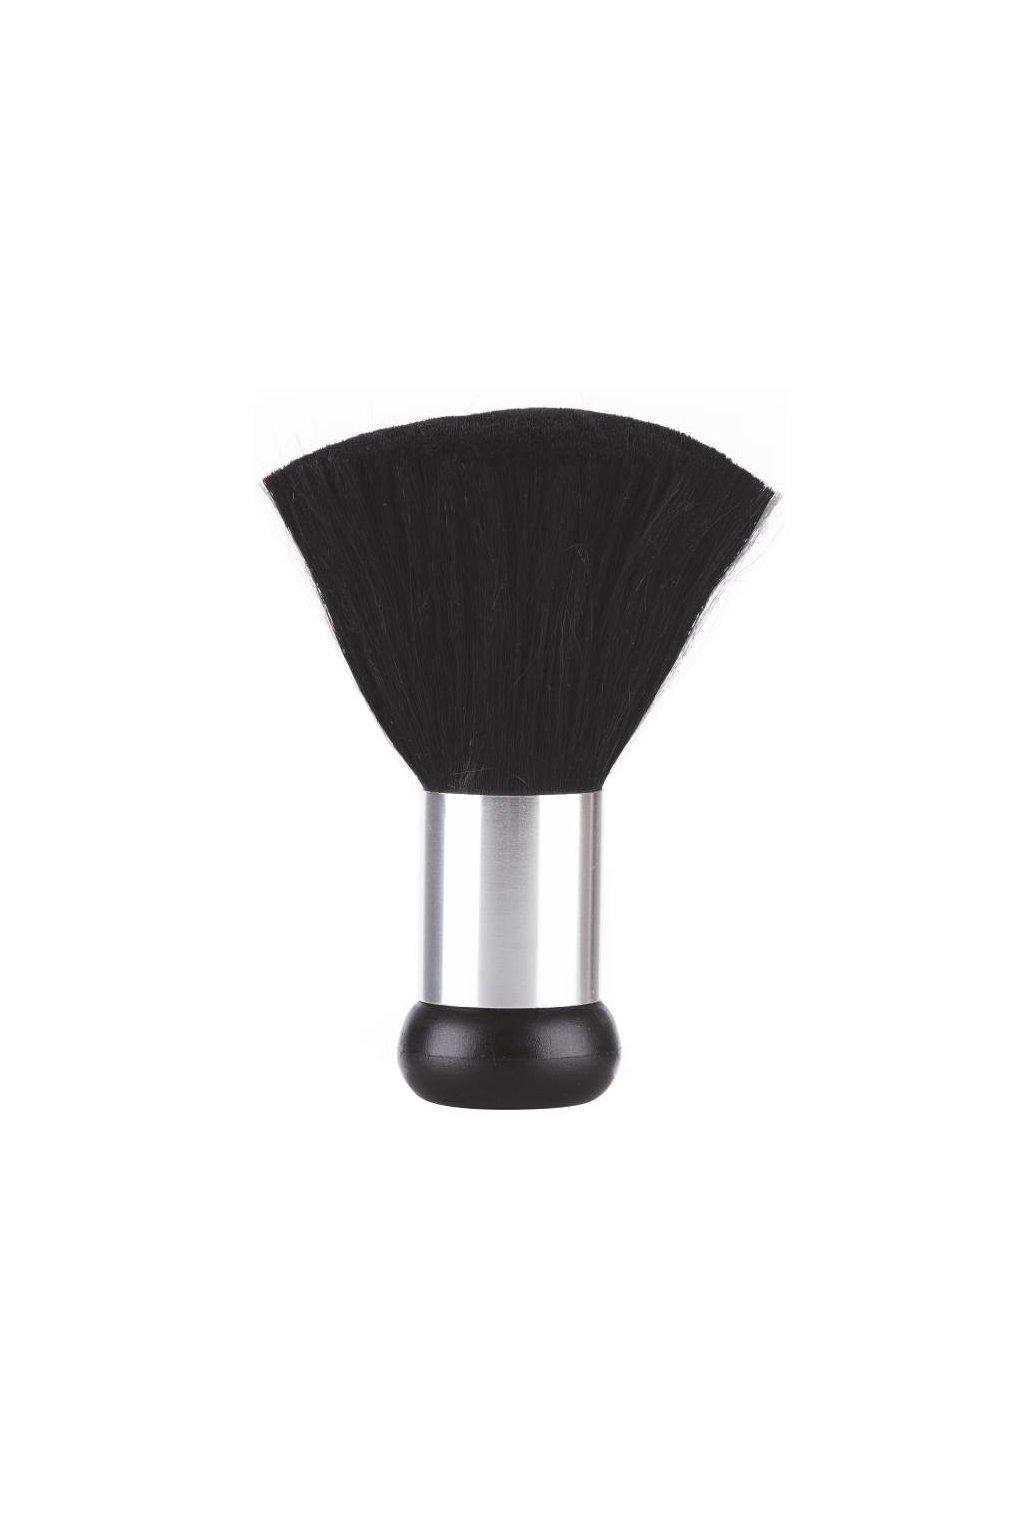 Oprašovák XAN černý, stříbrná obručka, jemné chlupy